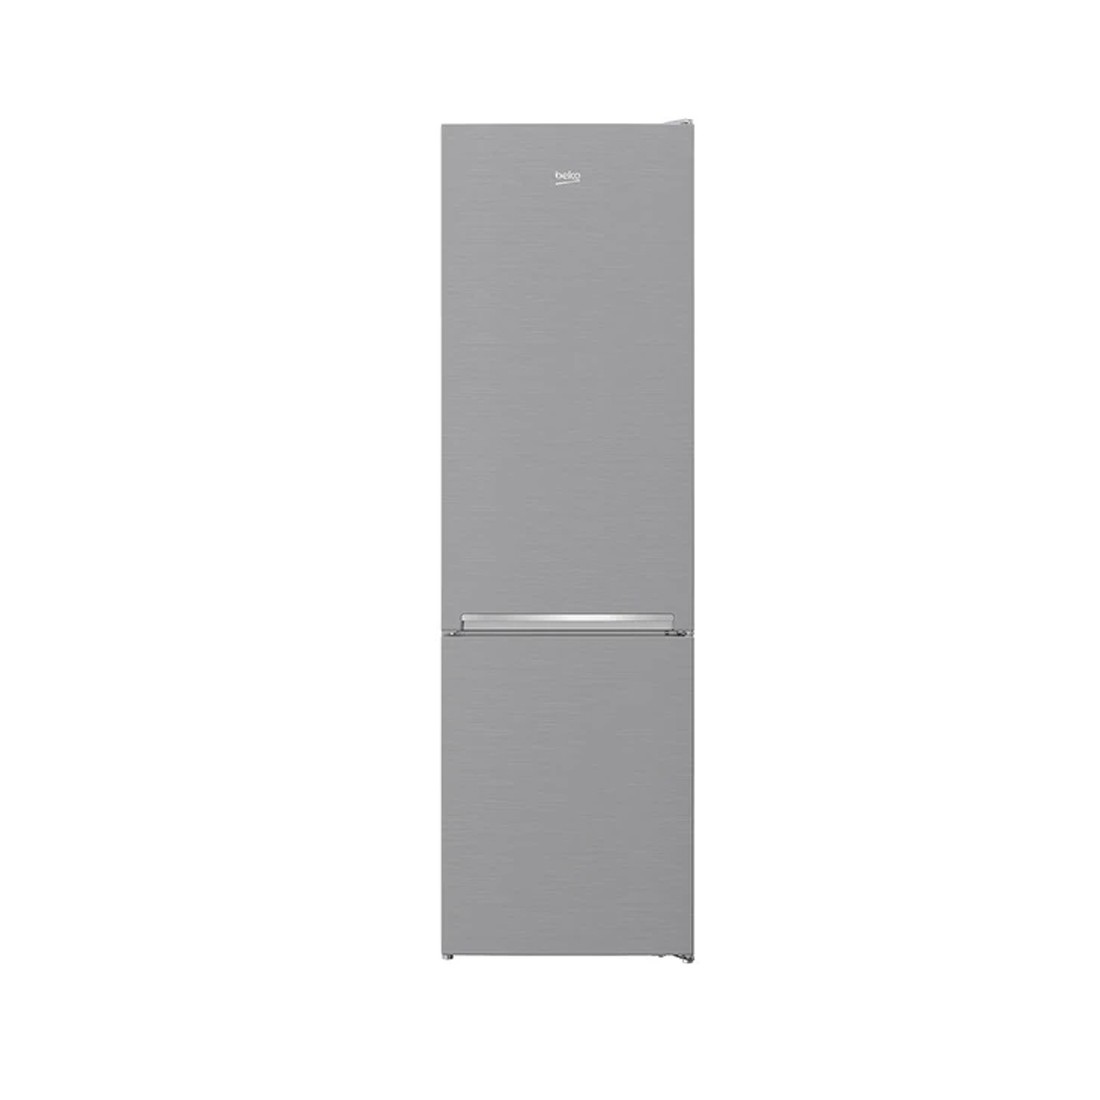 Combi Libre Instalación - Beko RCNA406K40XBN, Eficiencia A++, Blanco, Sin dispensador, Cíclico